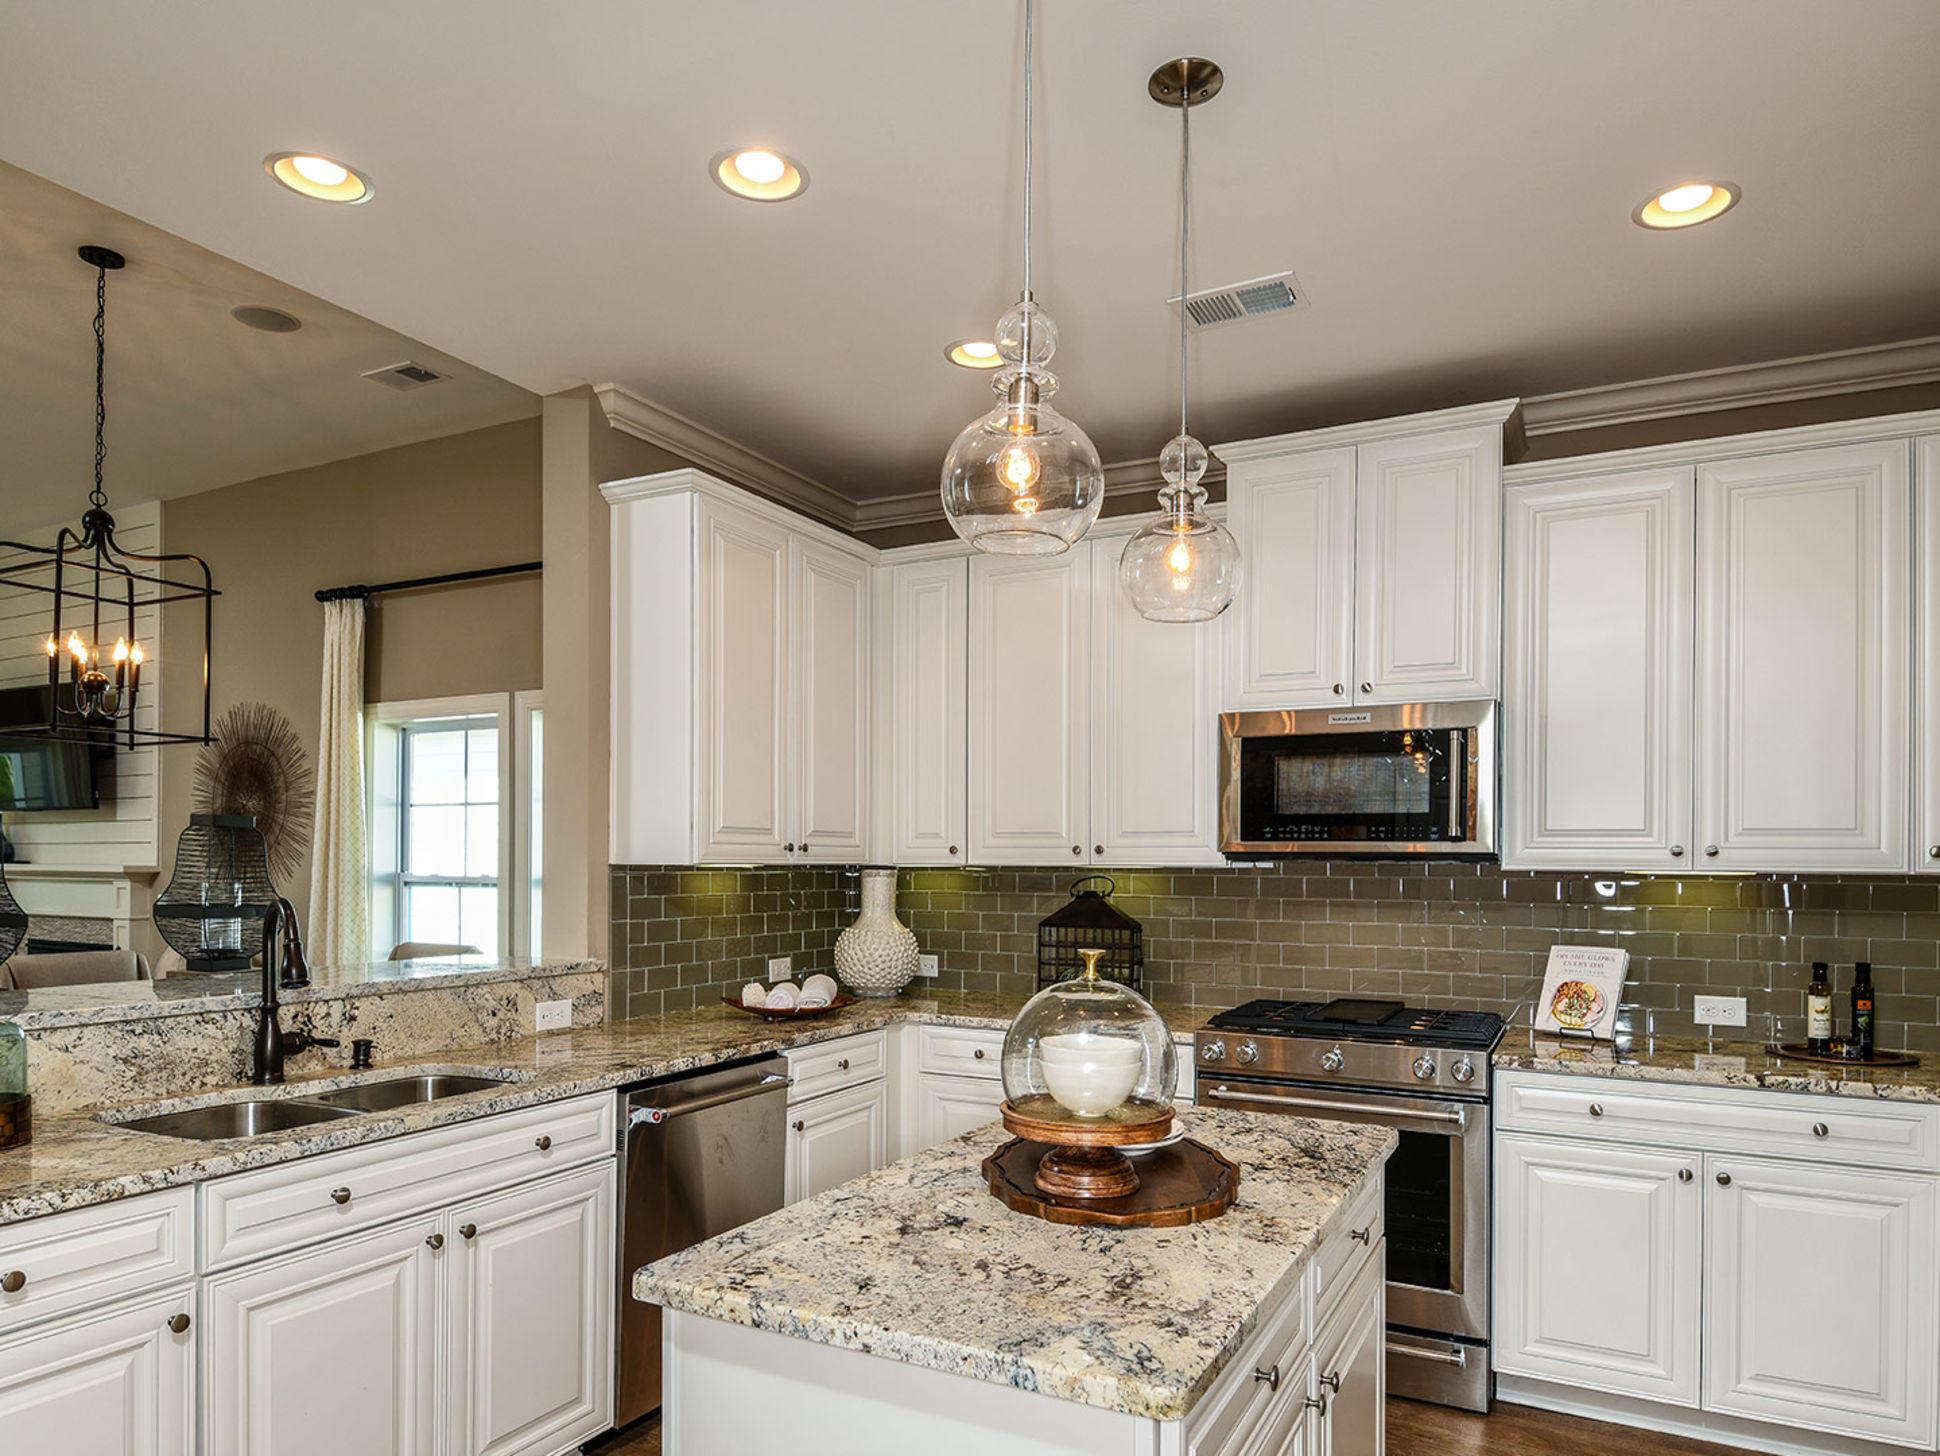 St. Johns Lake Homes For Sale - 5081 Catfish Loop, Johns Island, SC - 4